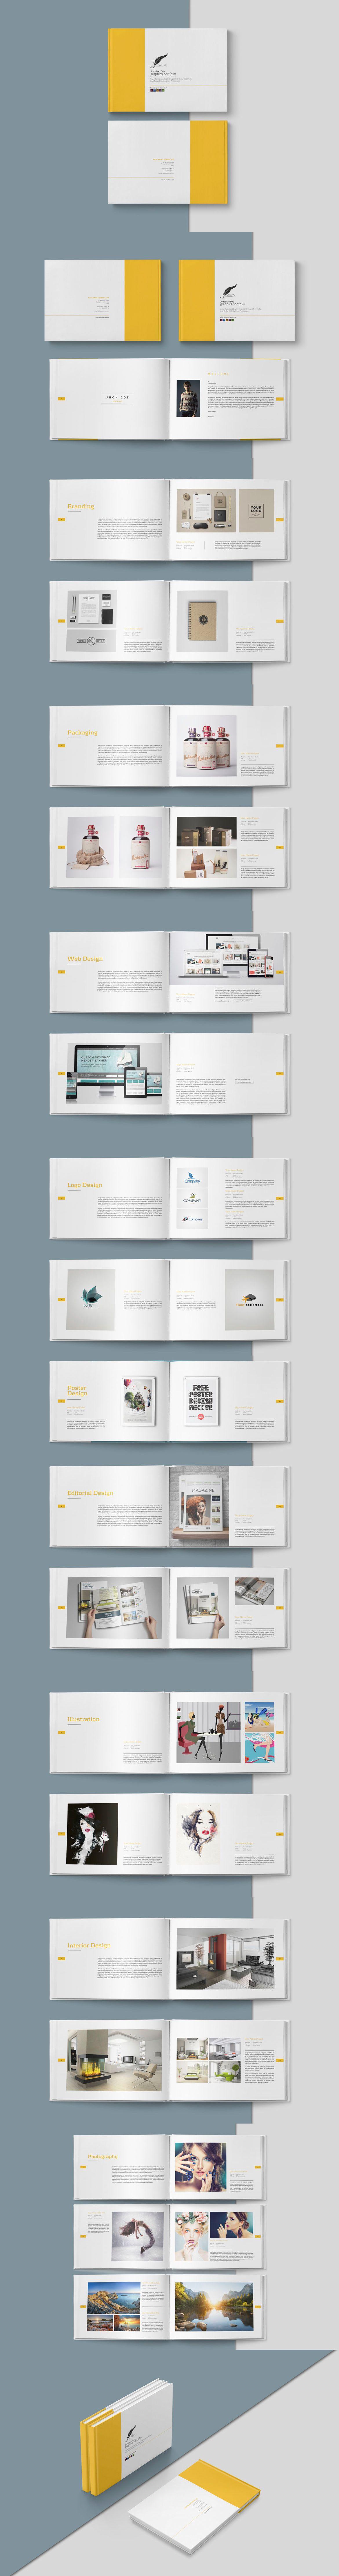 Graphic Design Portfolio Brochure Template InDesign INDD | Brochure ...